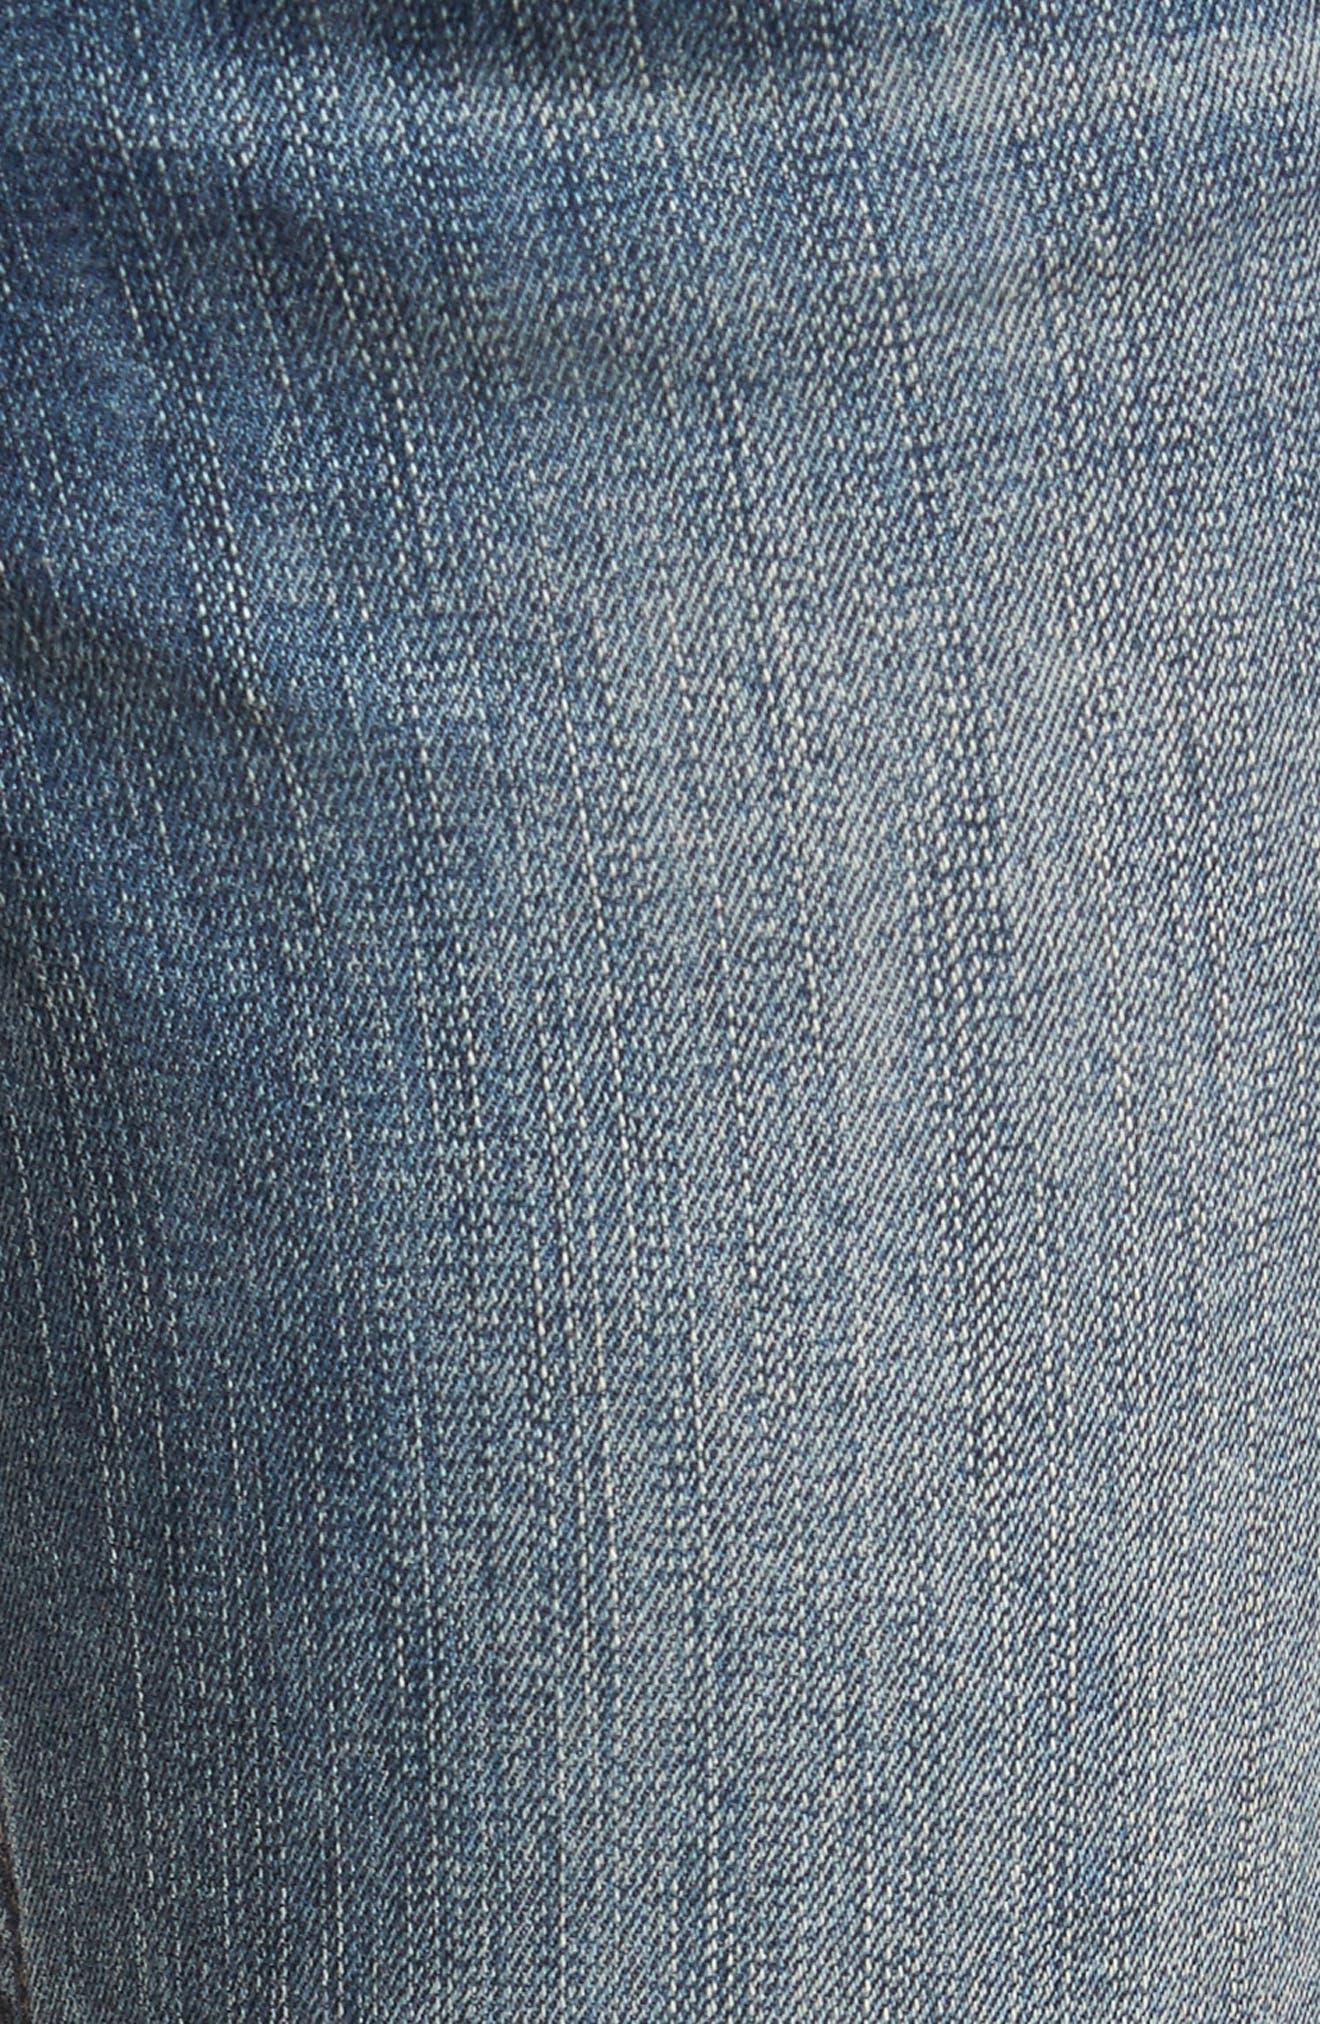 Alternate Image 5  - Treasure & Bond Ankle Skinny Jeans (Rain Dusk Destroy)